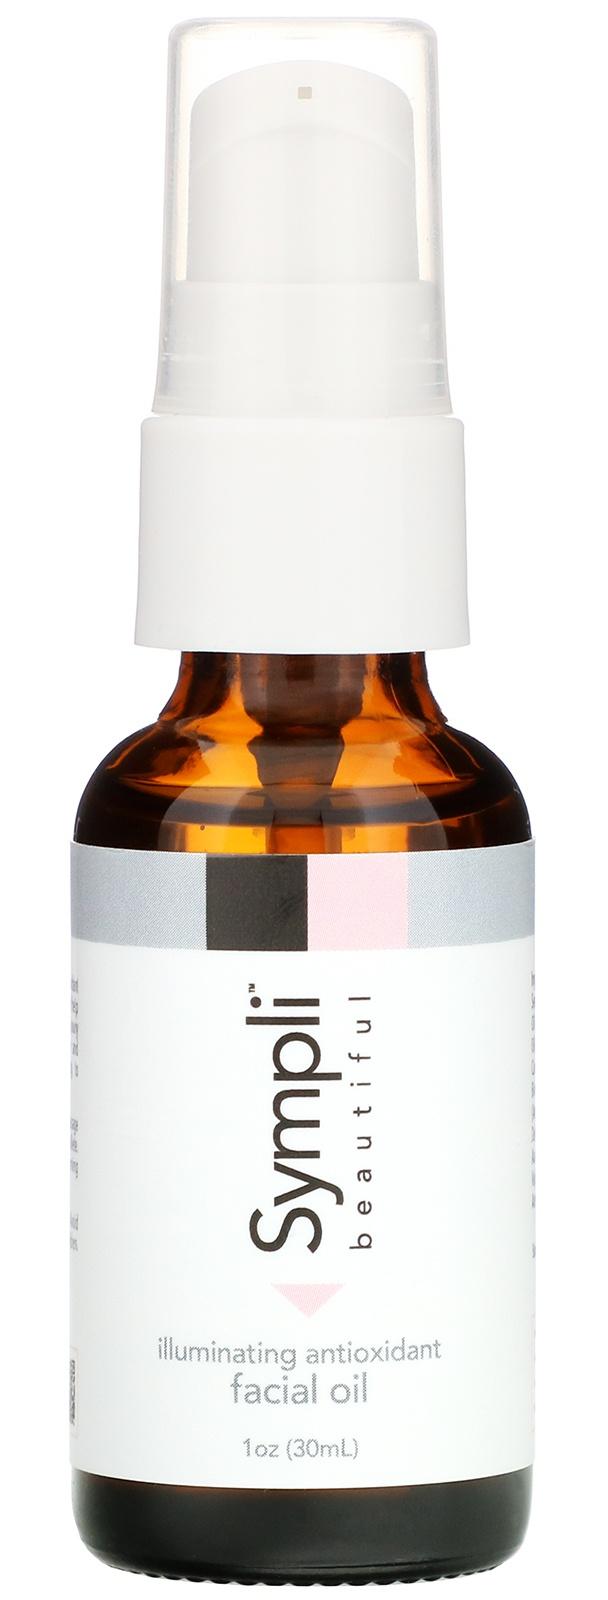 Sympli Beautiful Illuminating Antioxidant Facial Oil